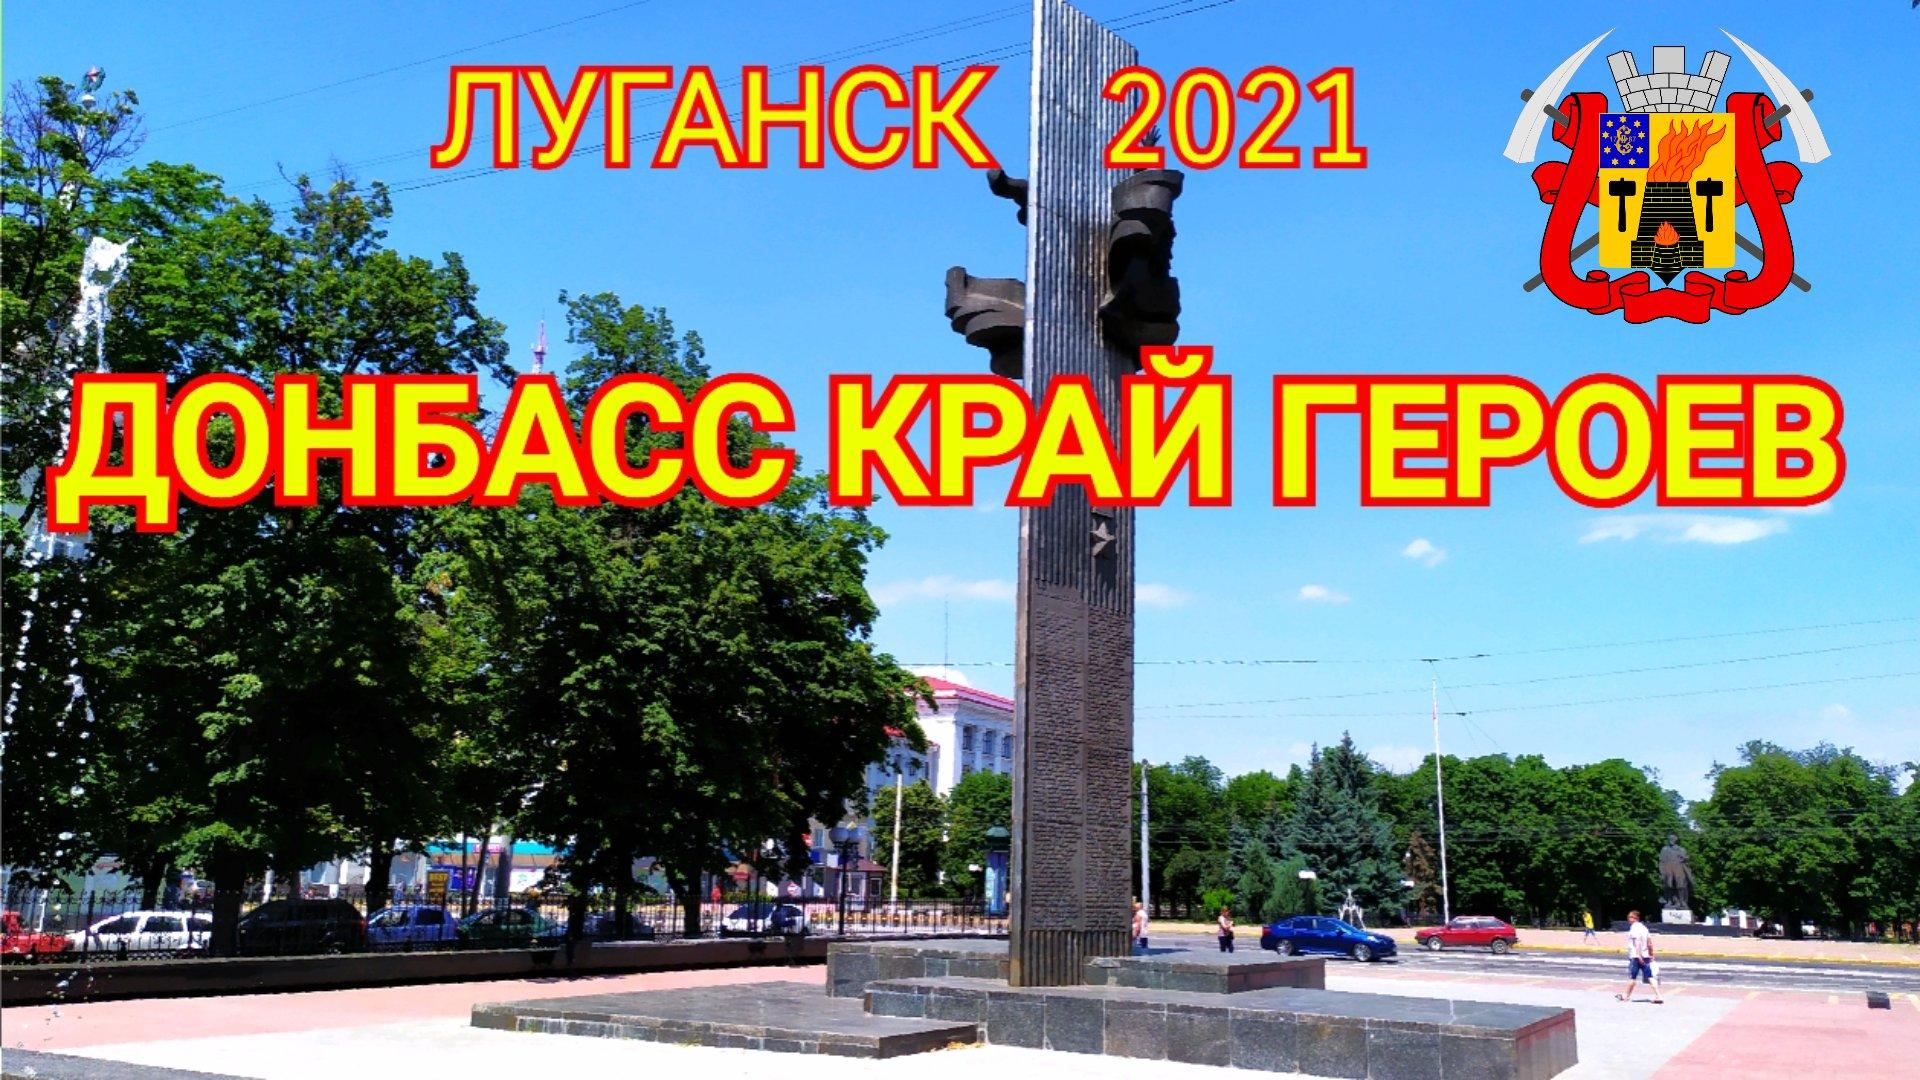 Донбасс край ГЕРОЕВ. Луганск 2021.